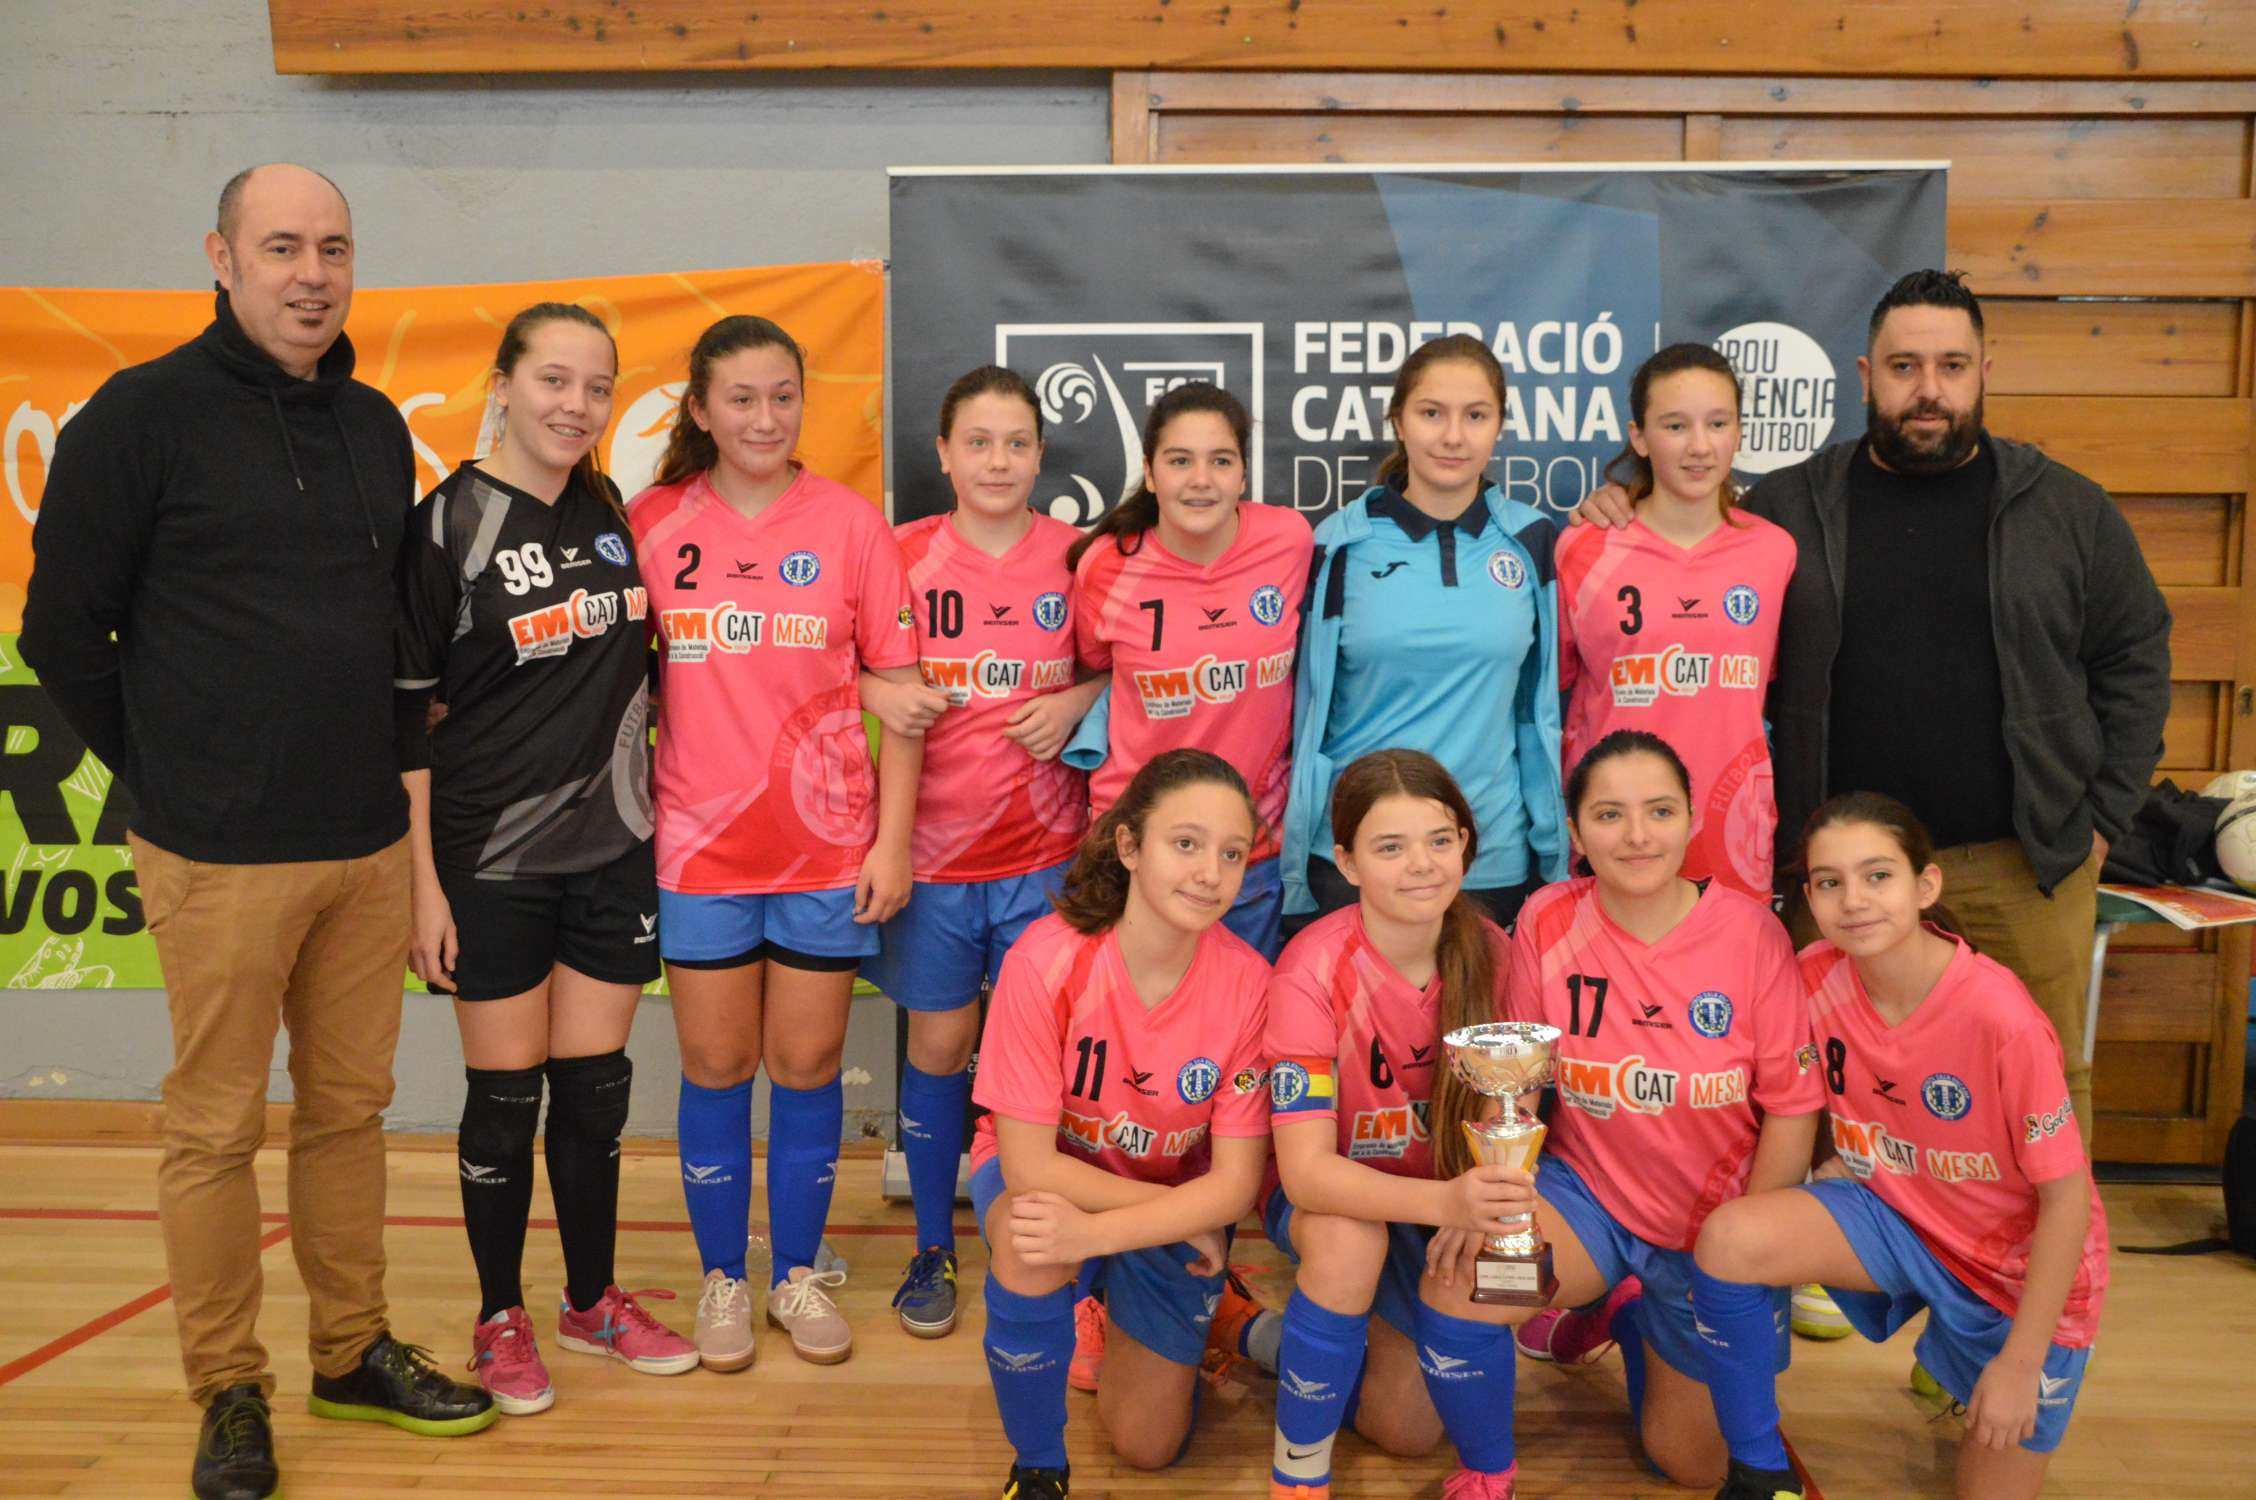 Campiones Cadet femení Copa Lleida - CFS Encamp (Clàudia Ramos)